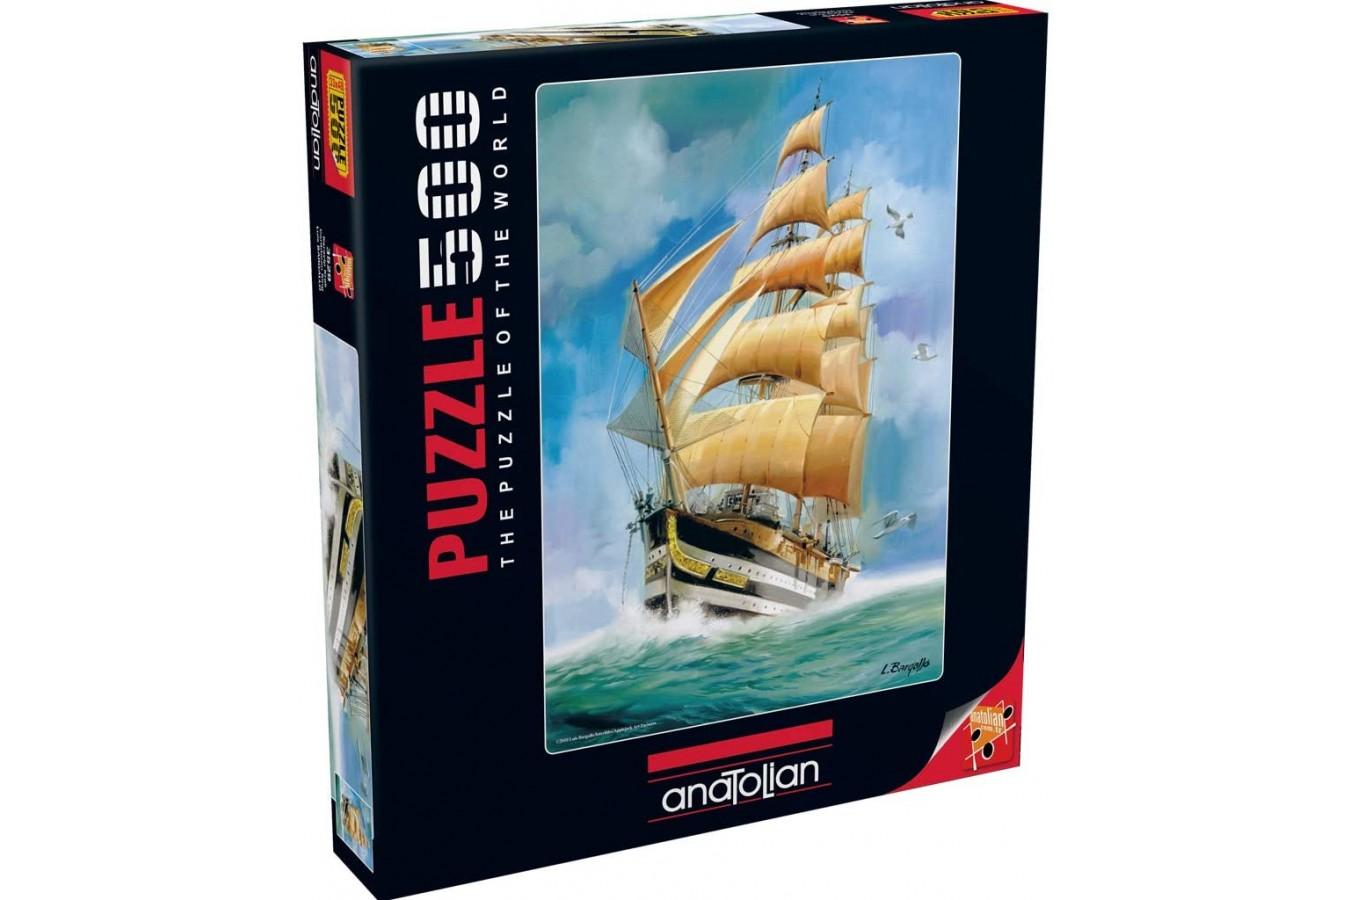 Puzzle Anatolian - Caribbean King, 500 piese (3529)